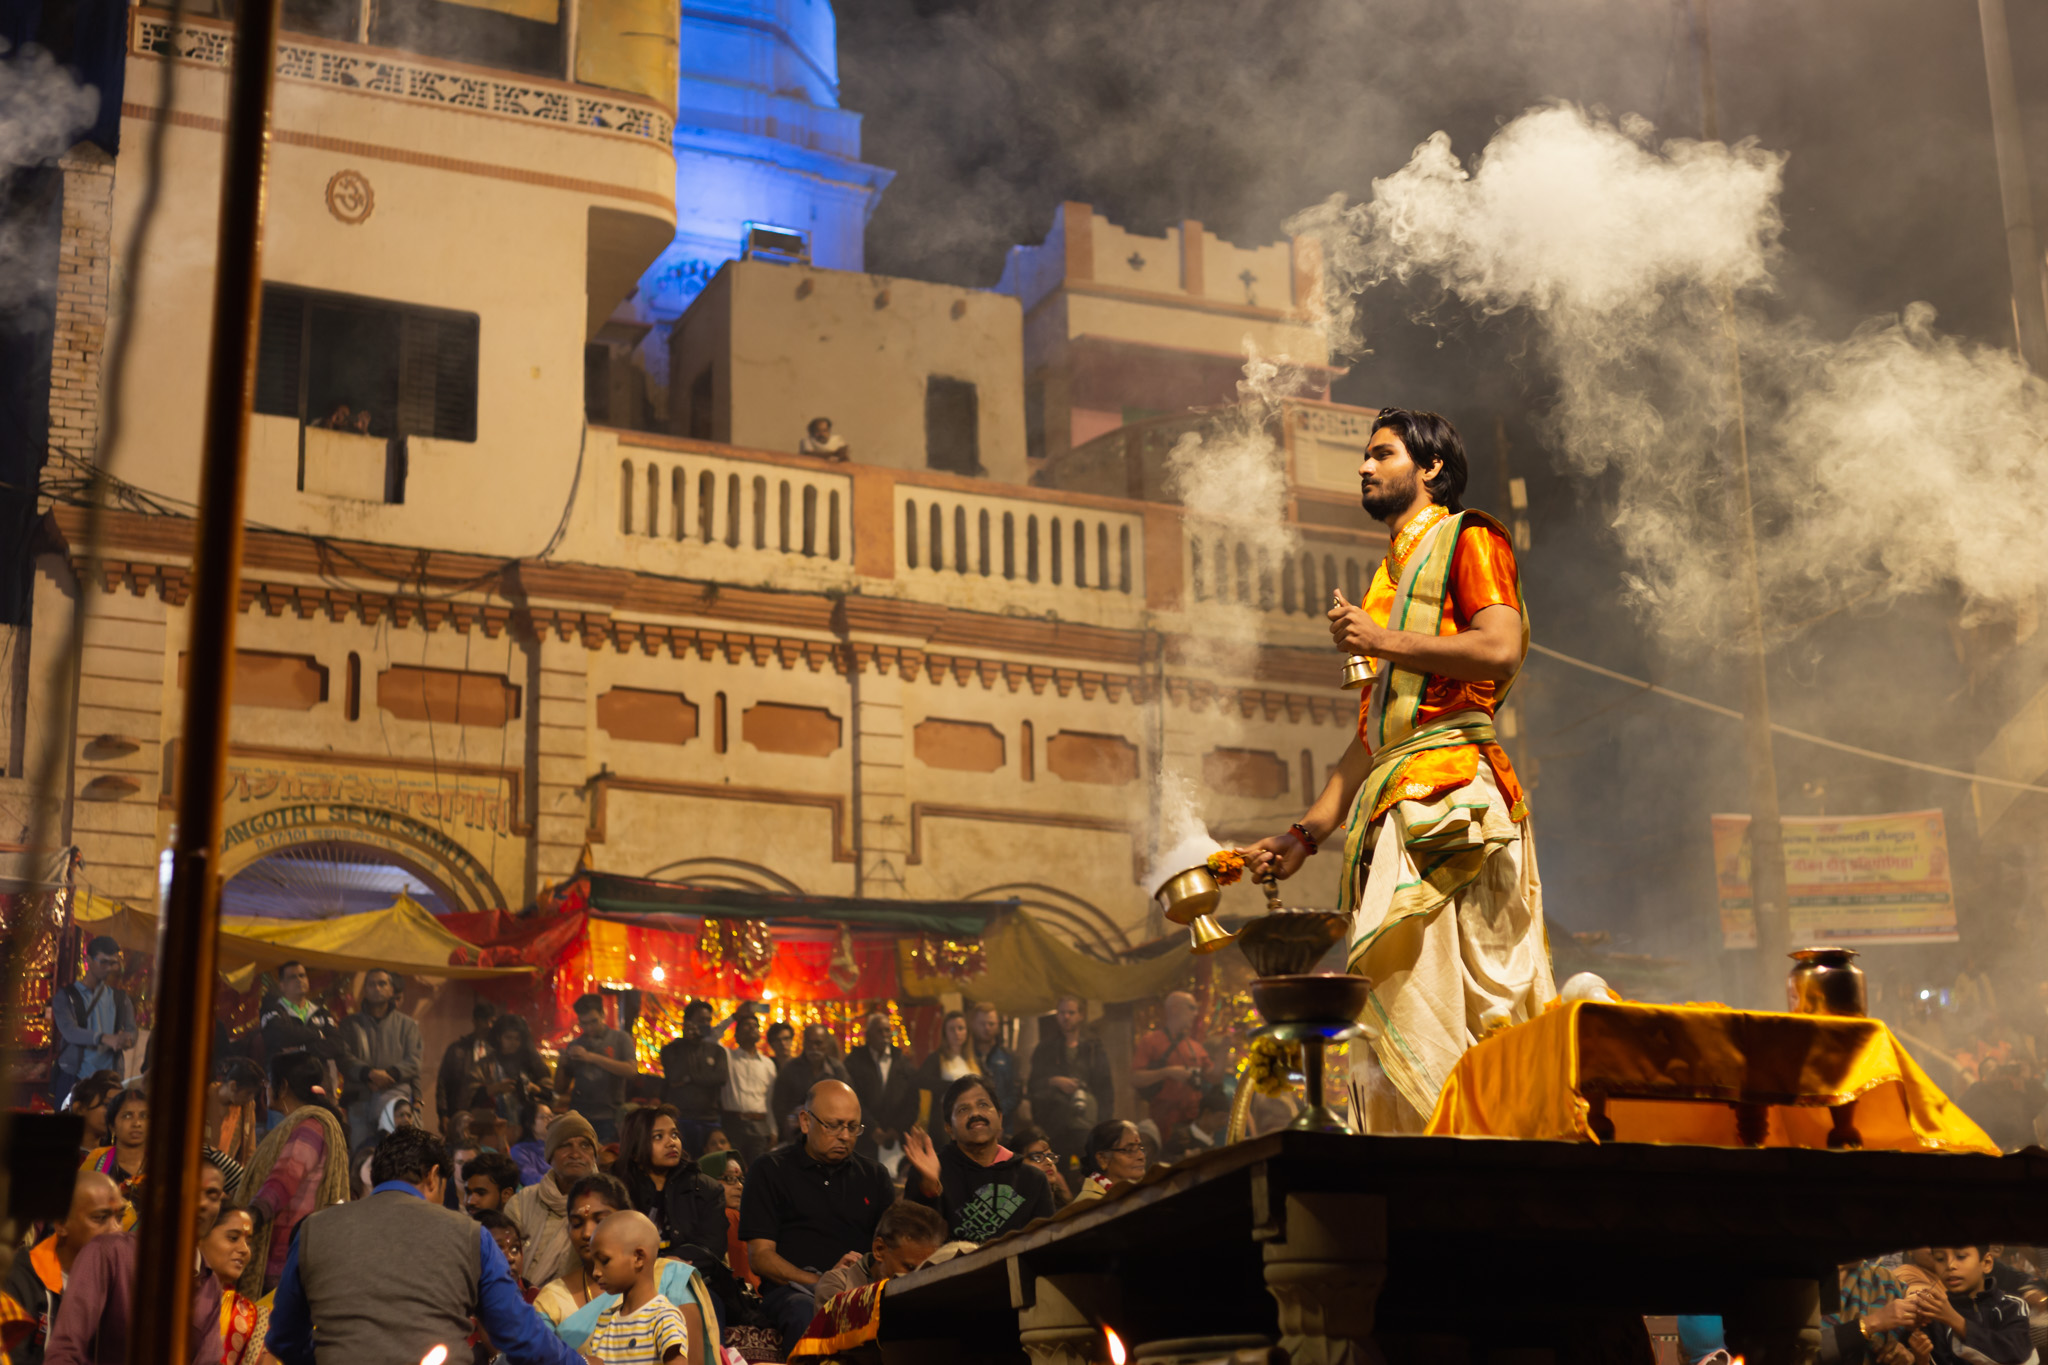 Man during evening ceremony in Varanasi, India.